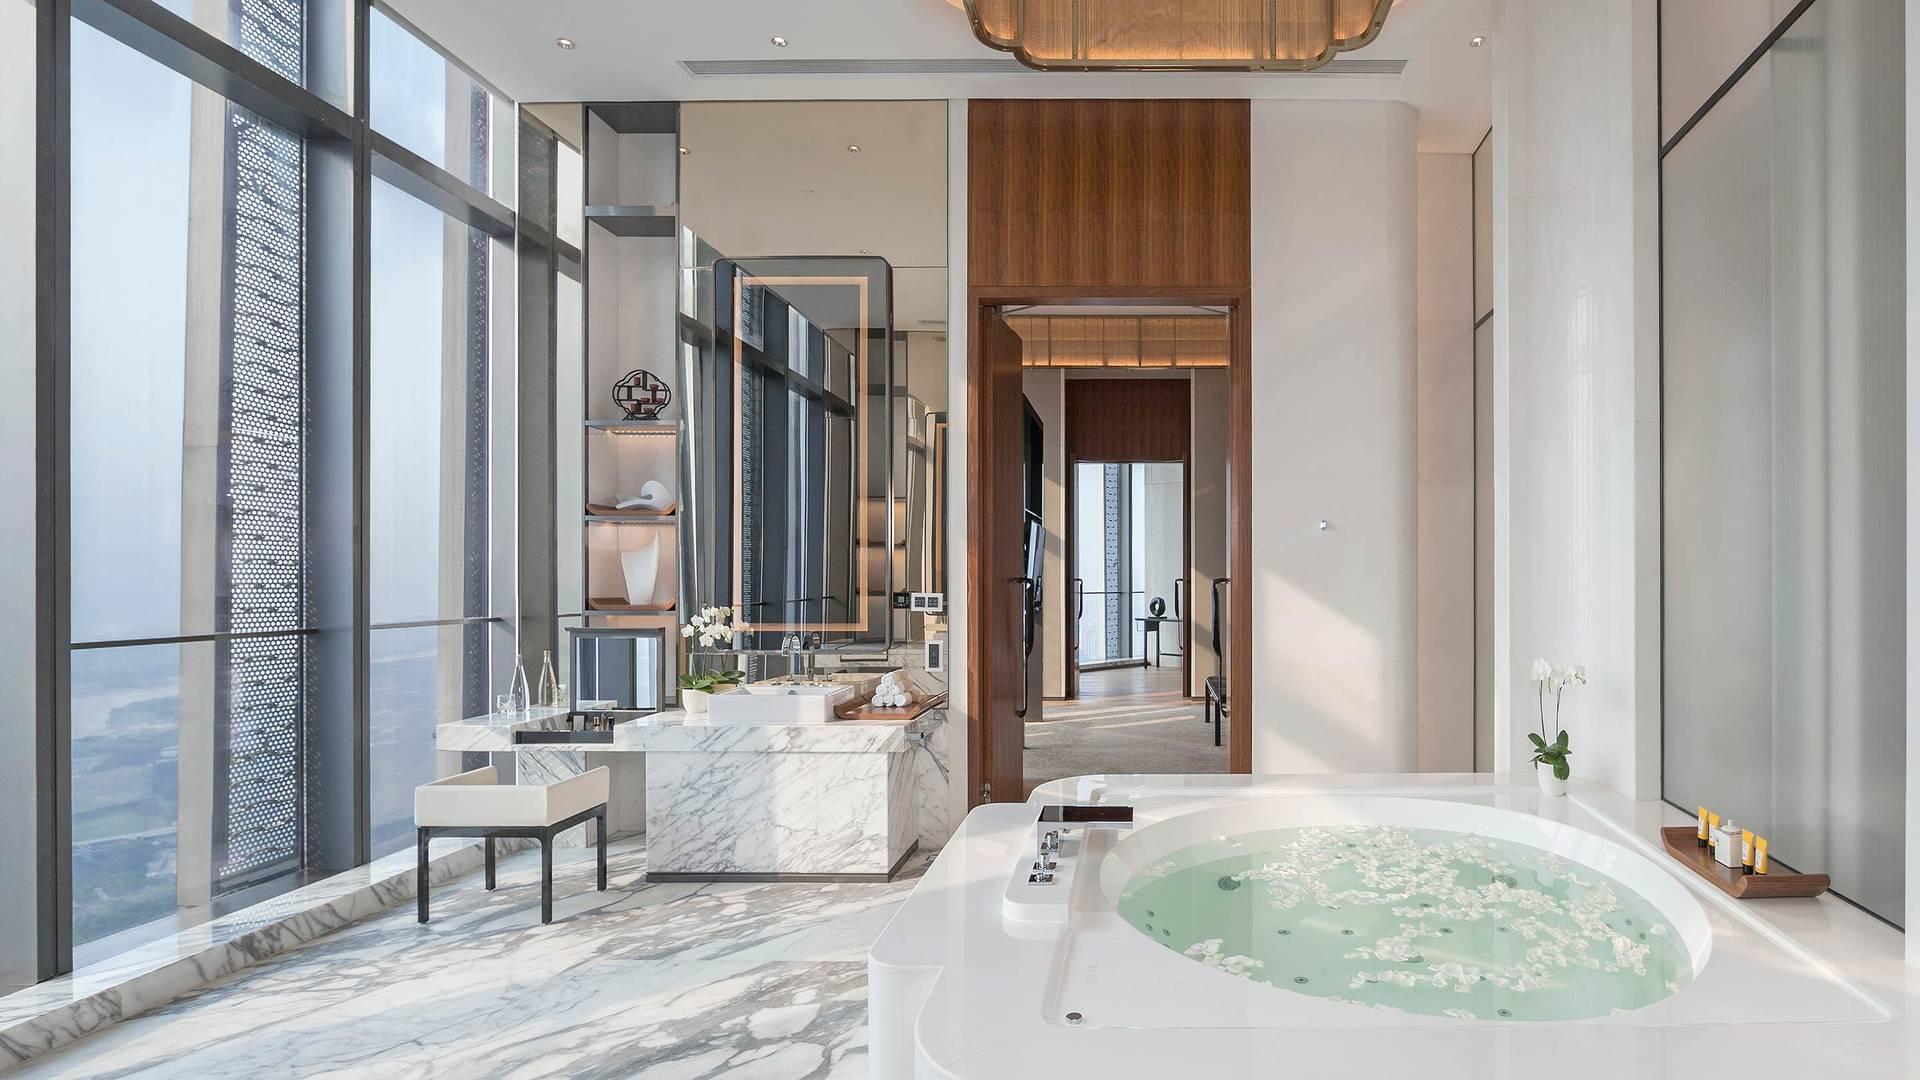 Jumeirah Nanjing Presidential suite business bathroom_16-9